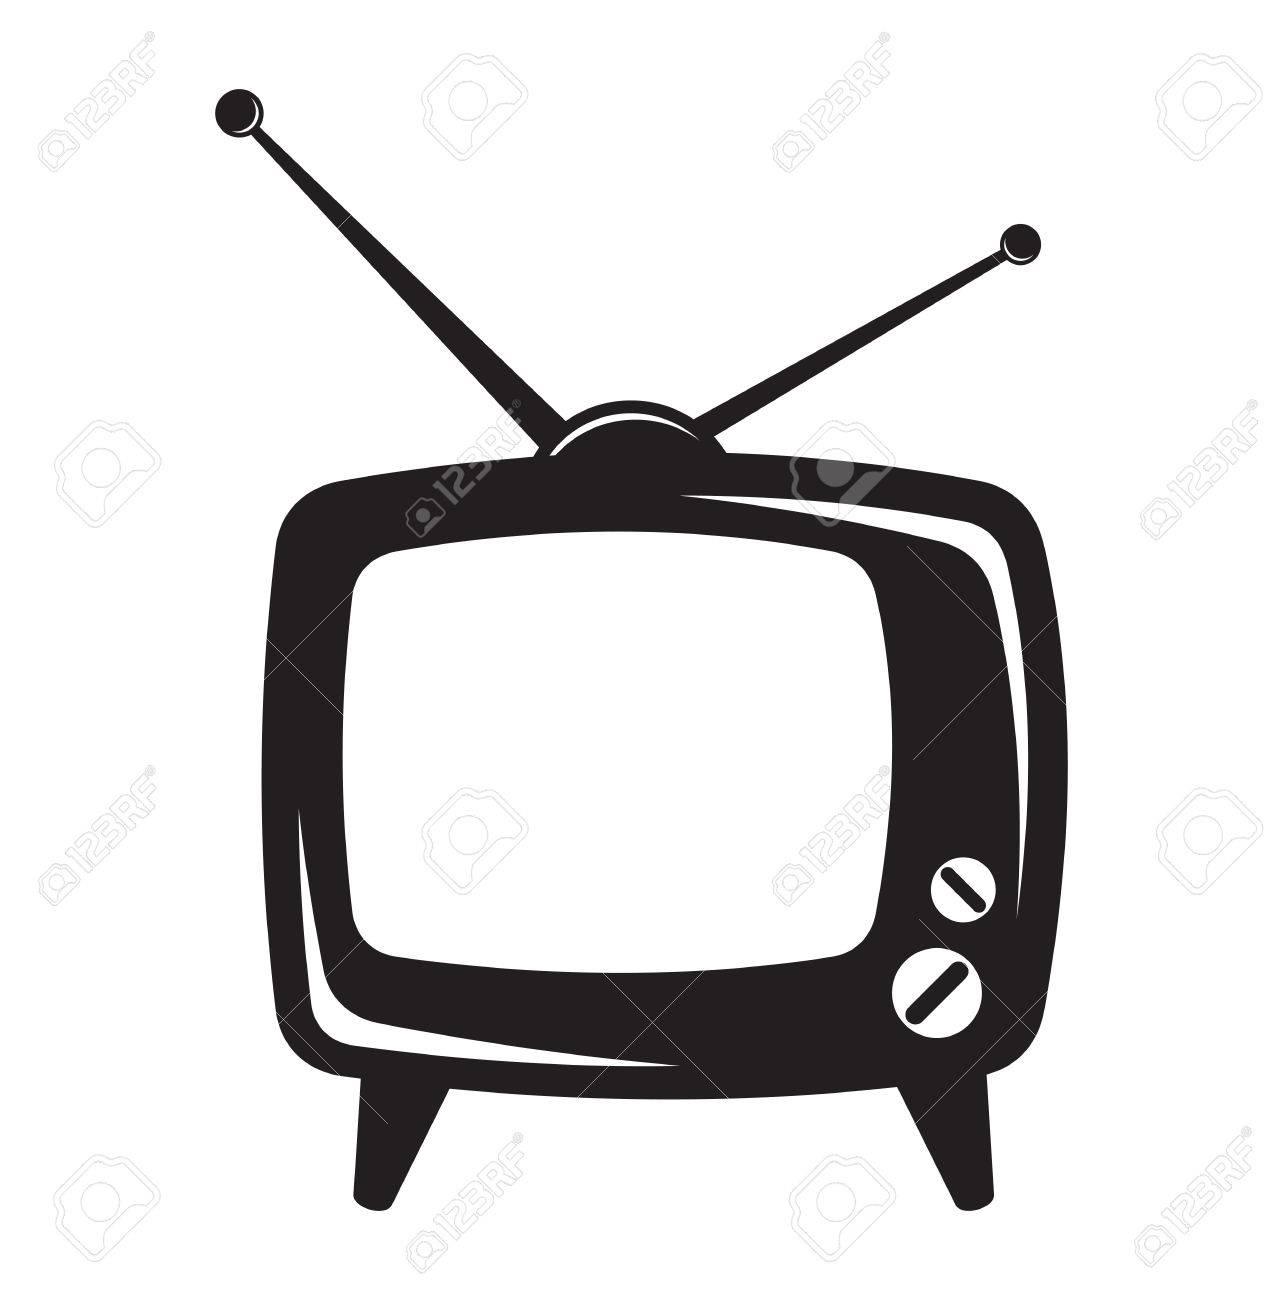 Retro tv clipart 1 » Clipart Station.